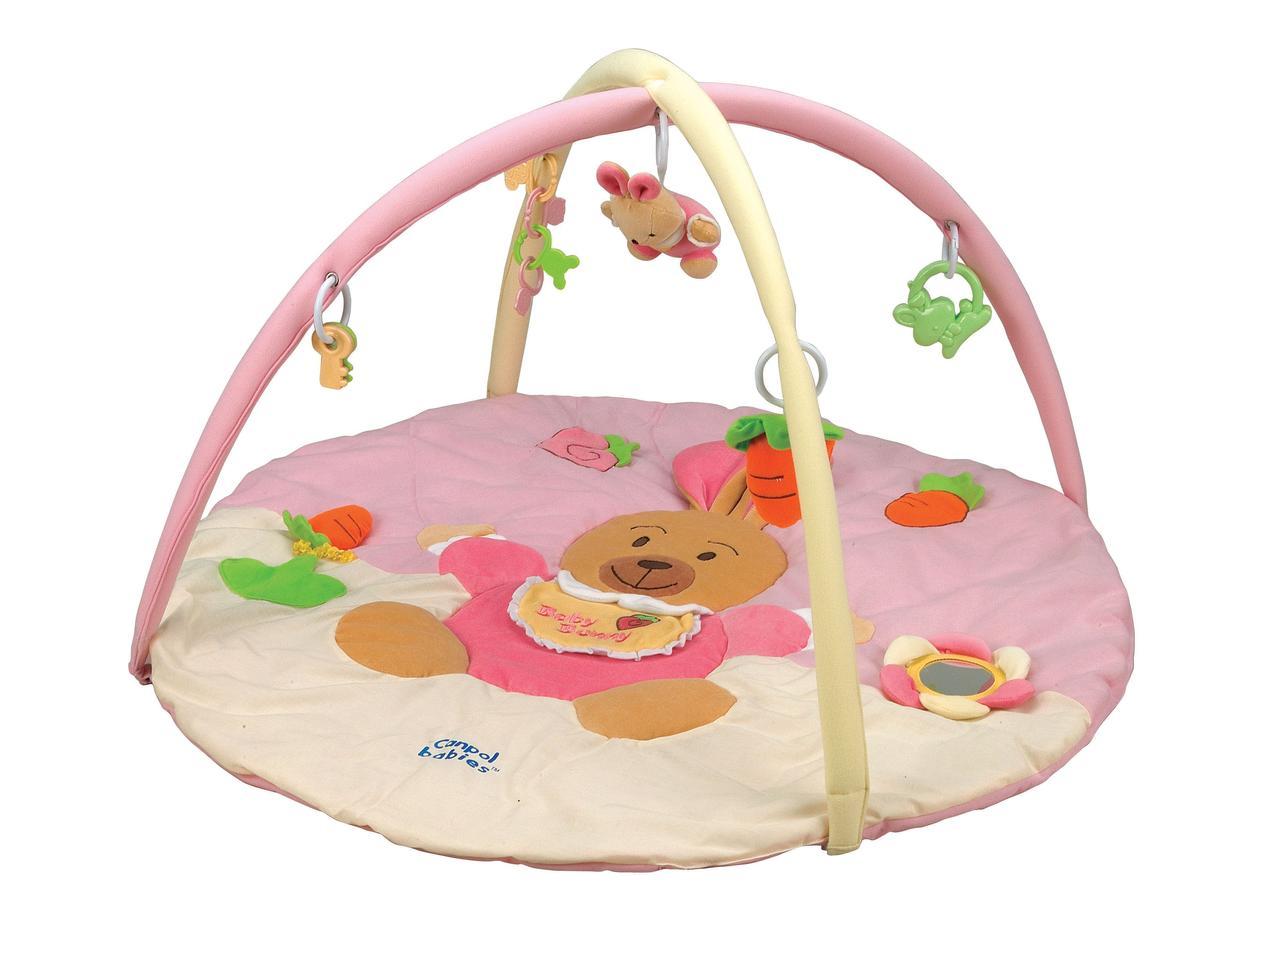 Развивающий коврик Кролик ТМ Canpol Babies